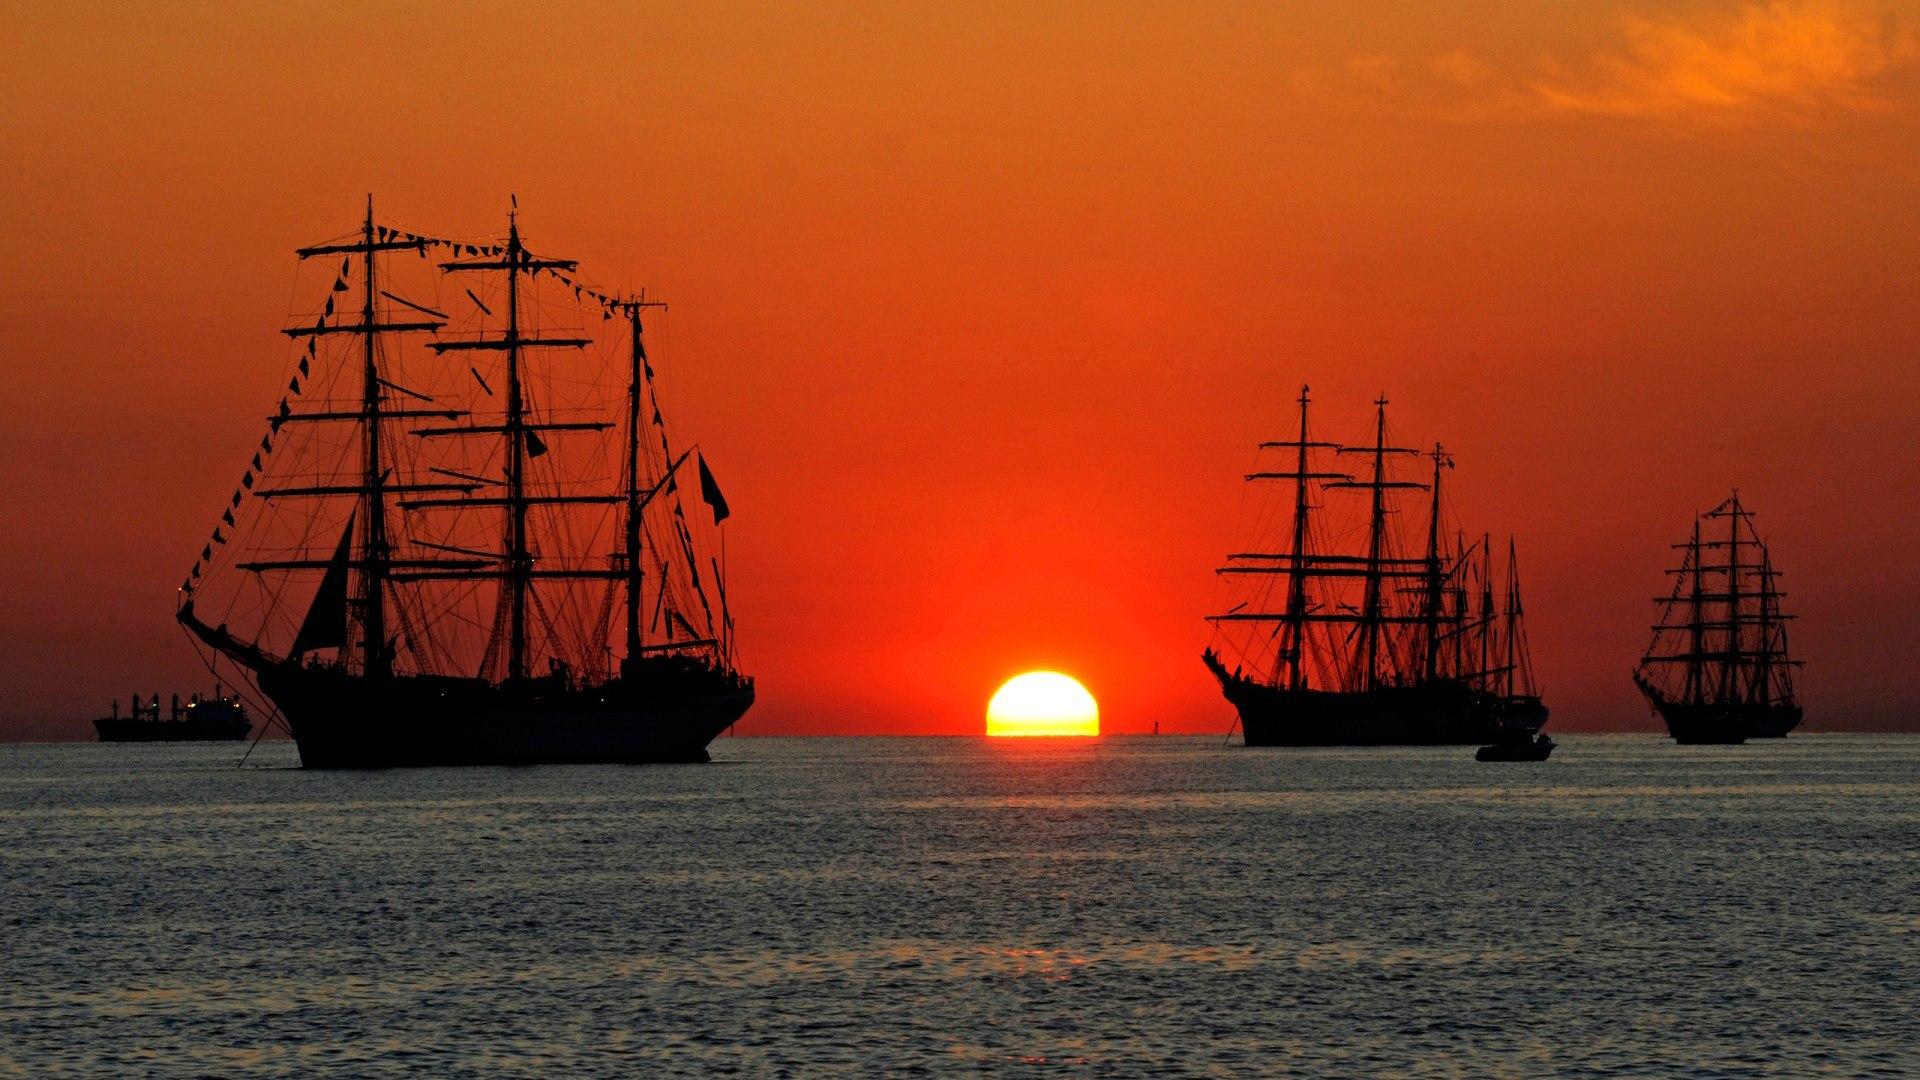 Днем газовика, корабли на открытках фото